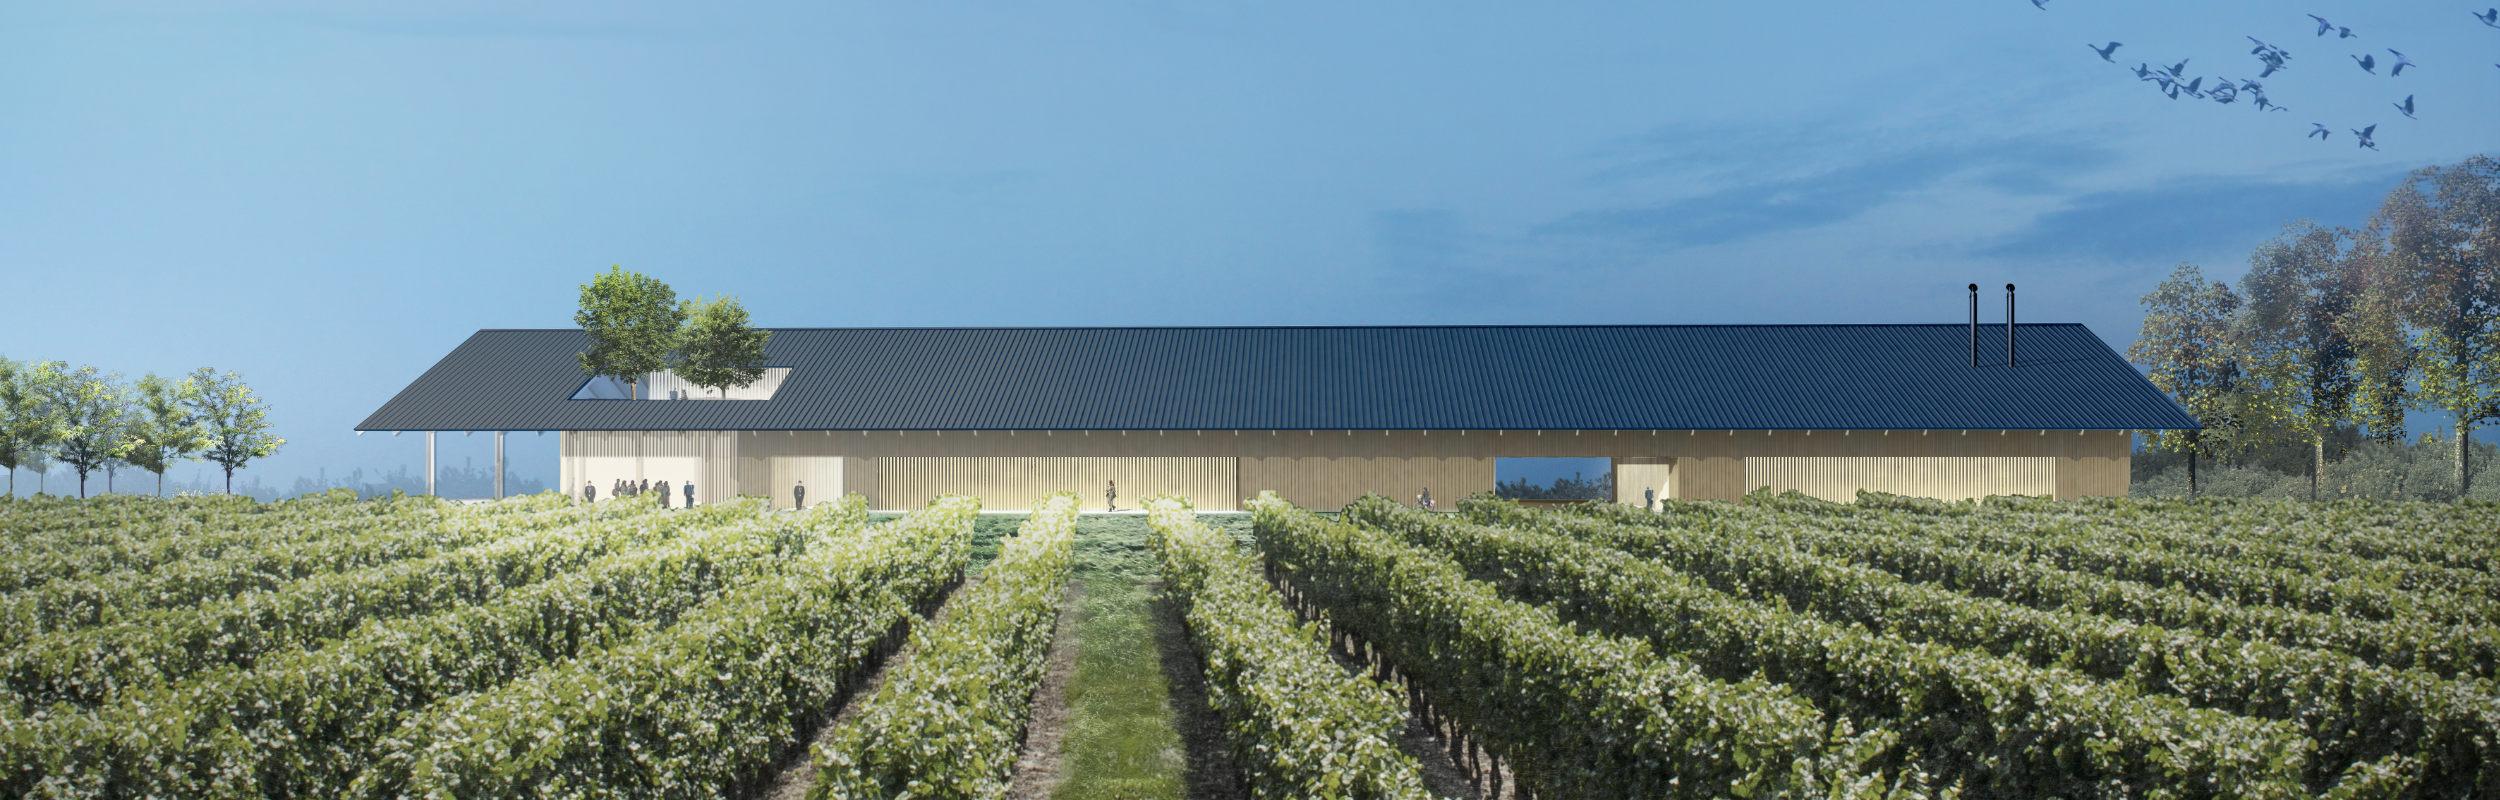 TRK Winery Front.jpg